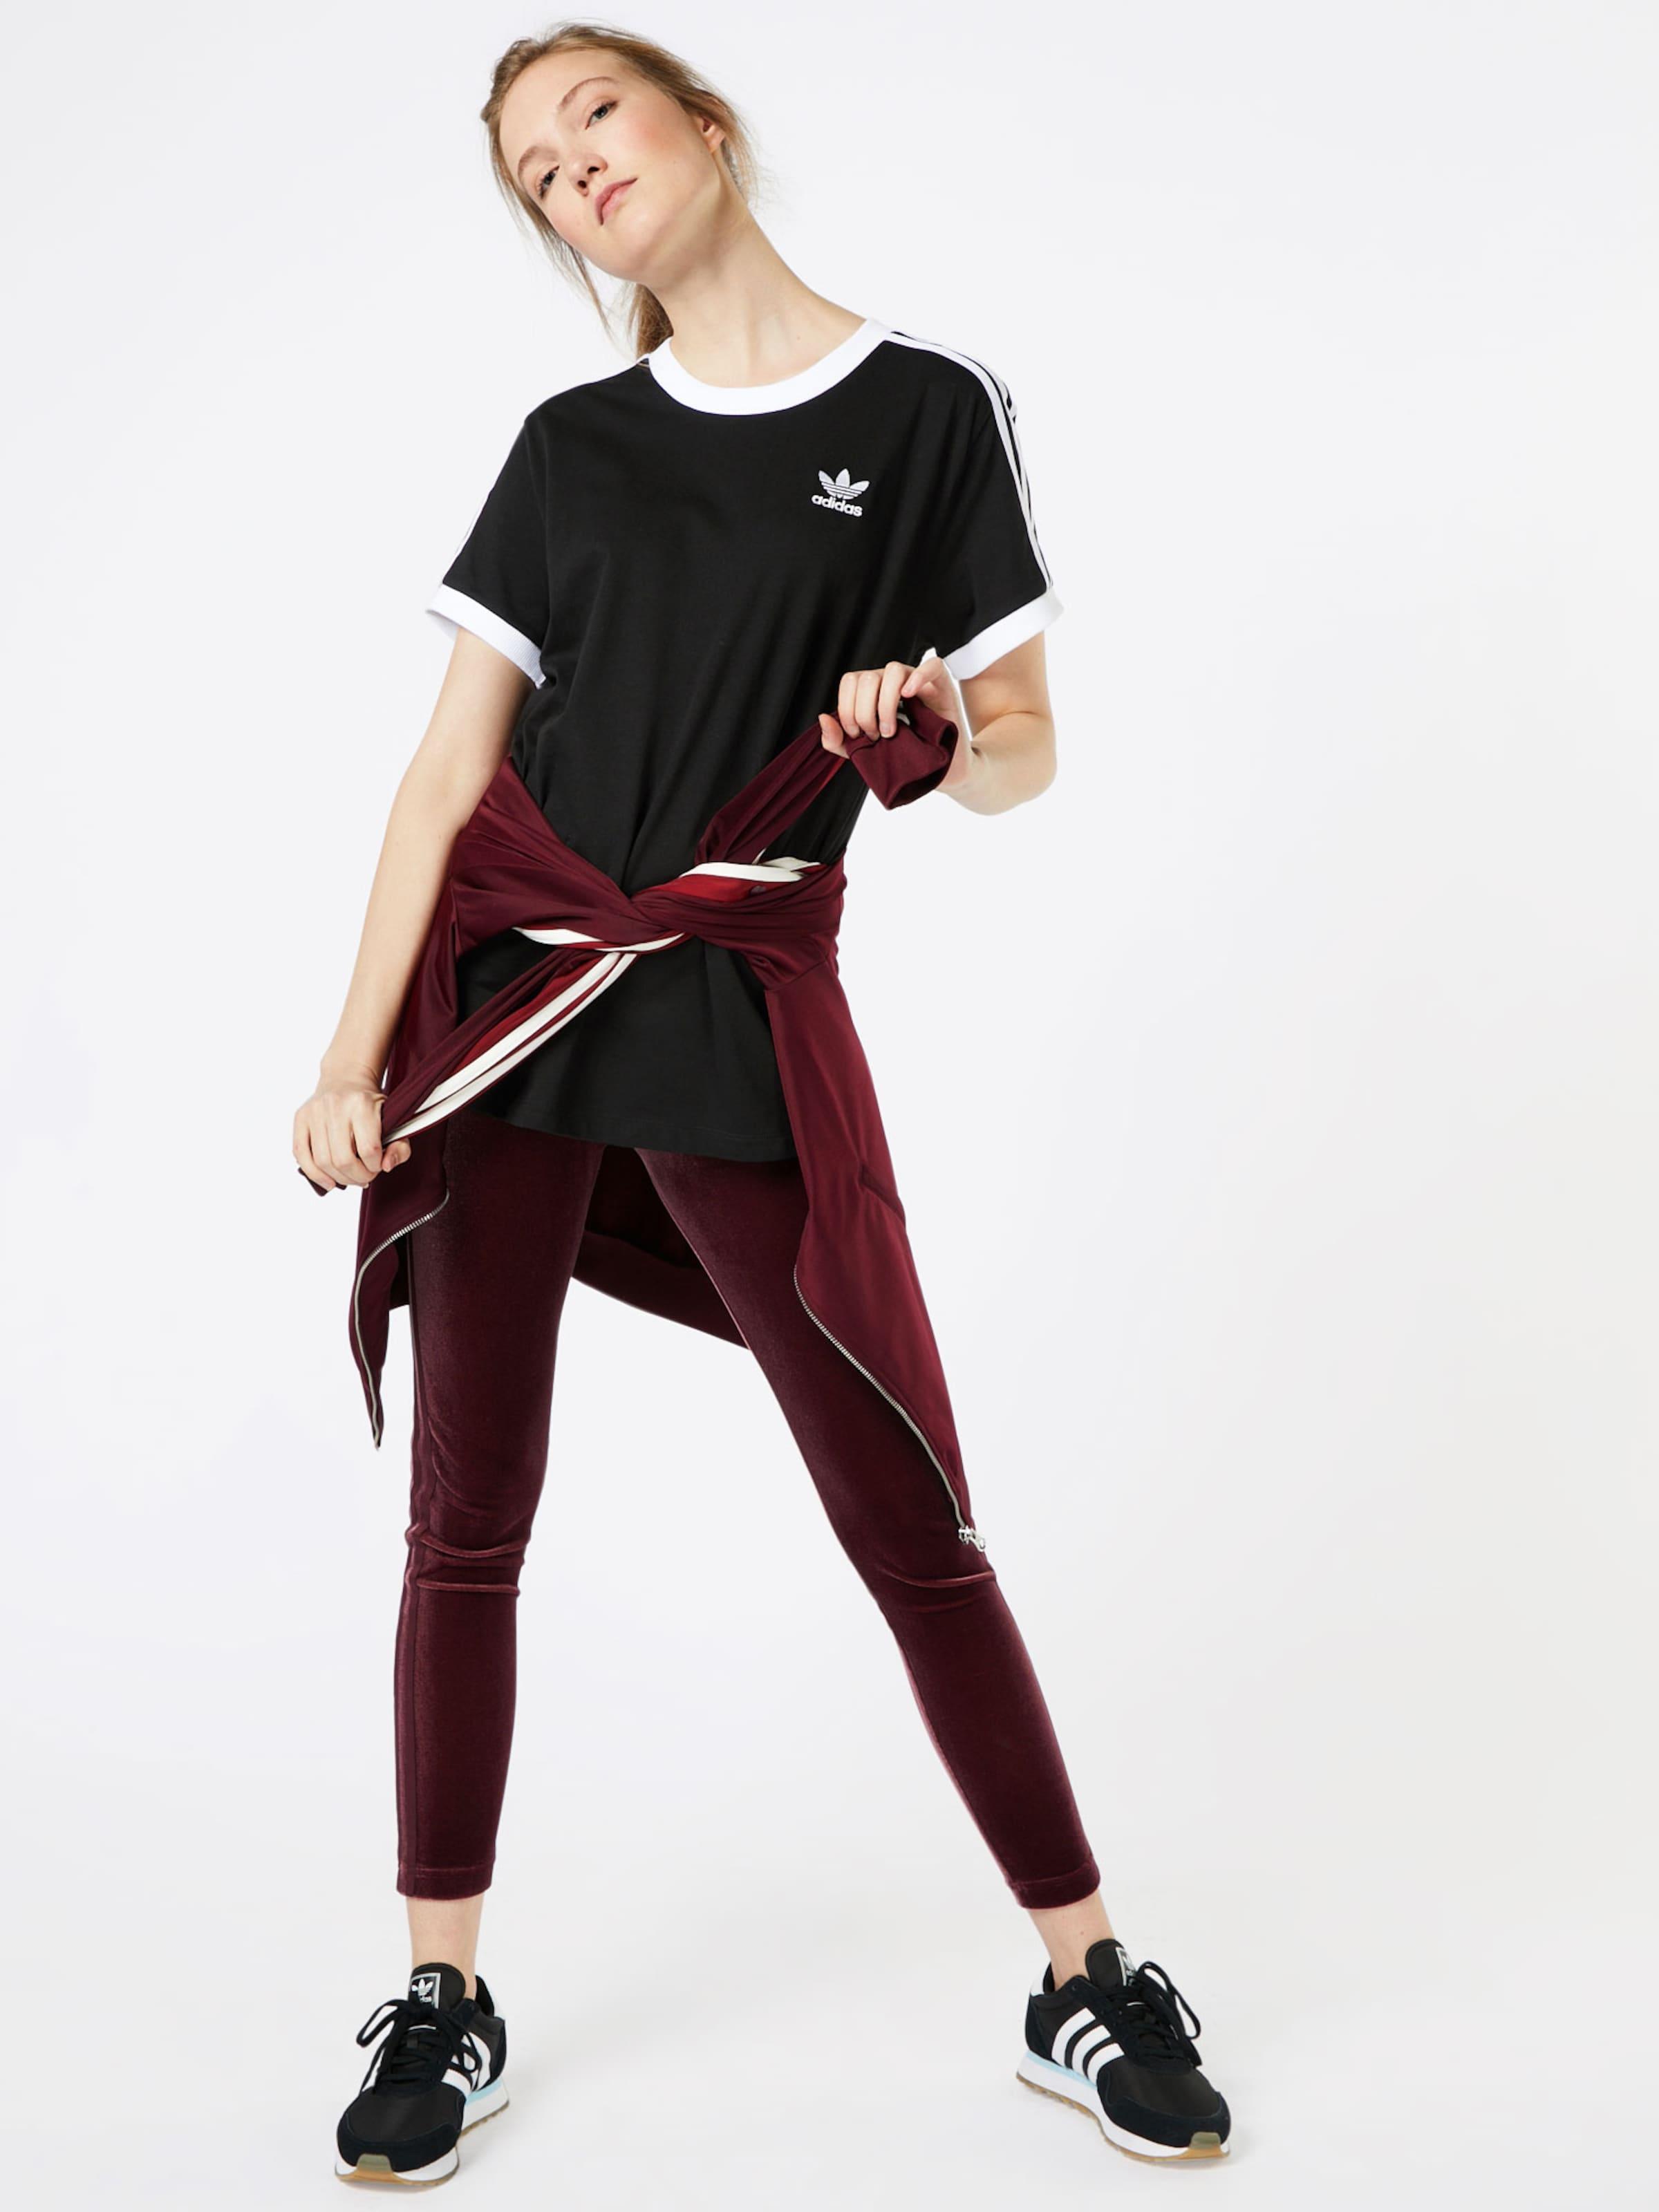 Stripes' Noir Originals T En Adidas shirt '3 LSzVMpGjqU